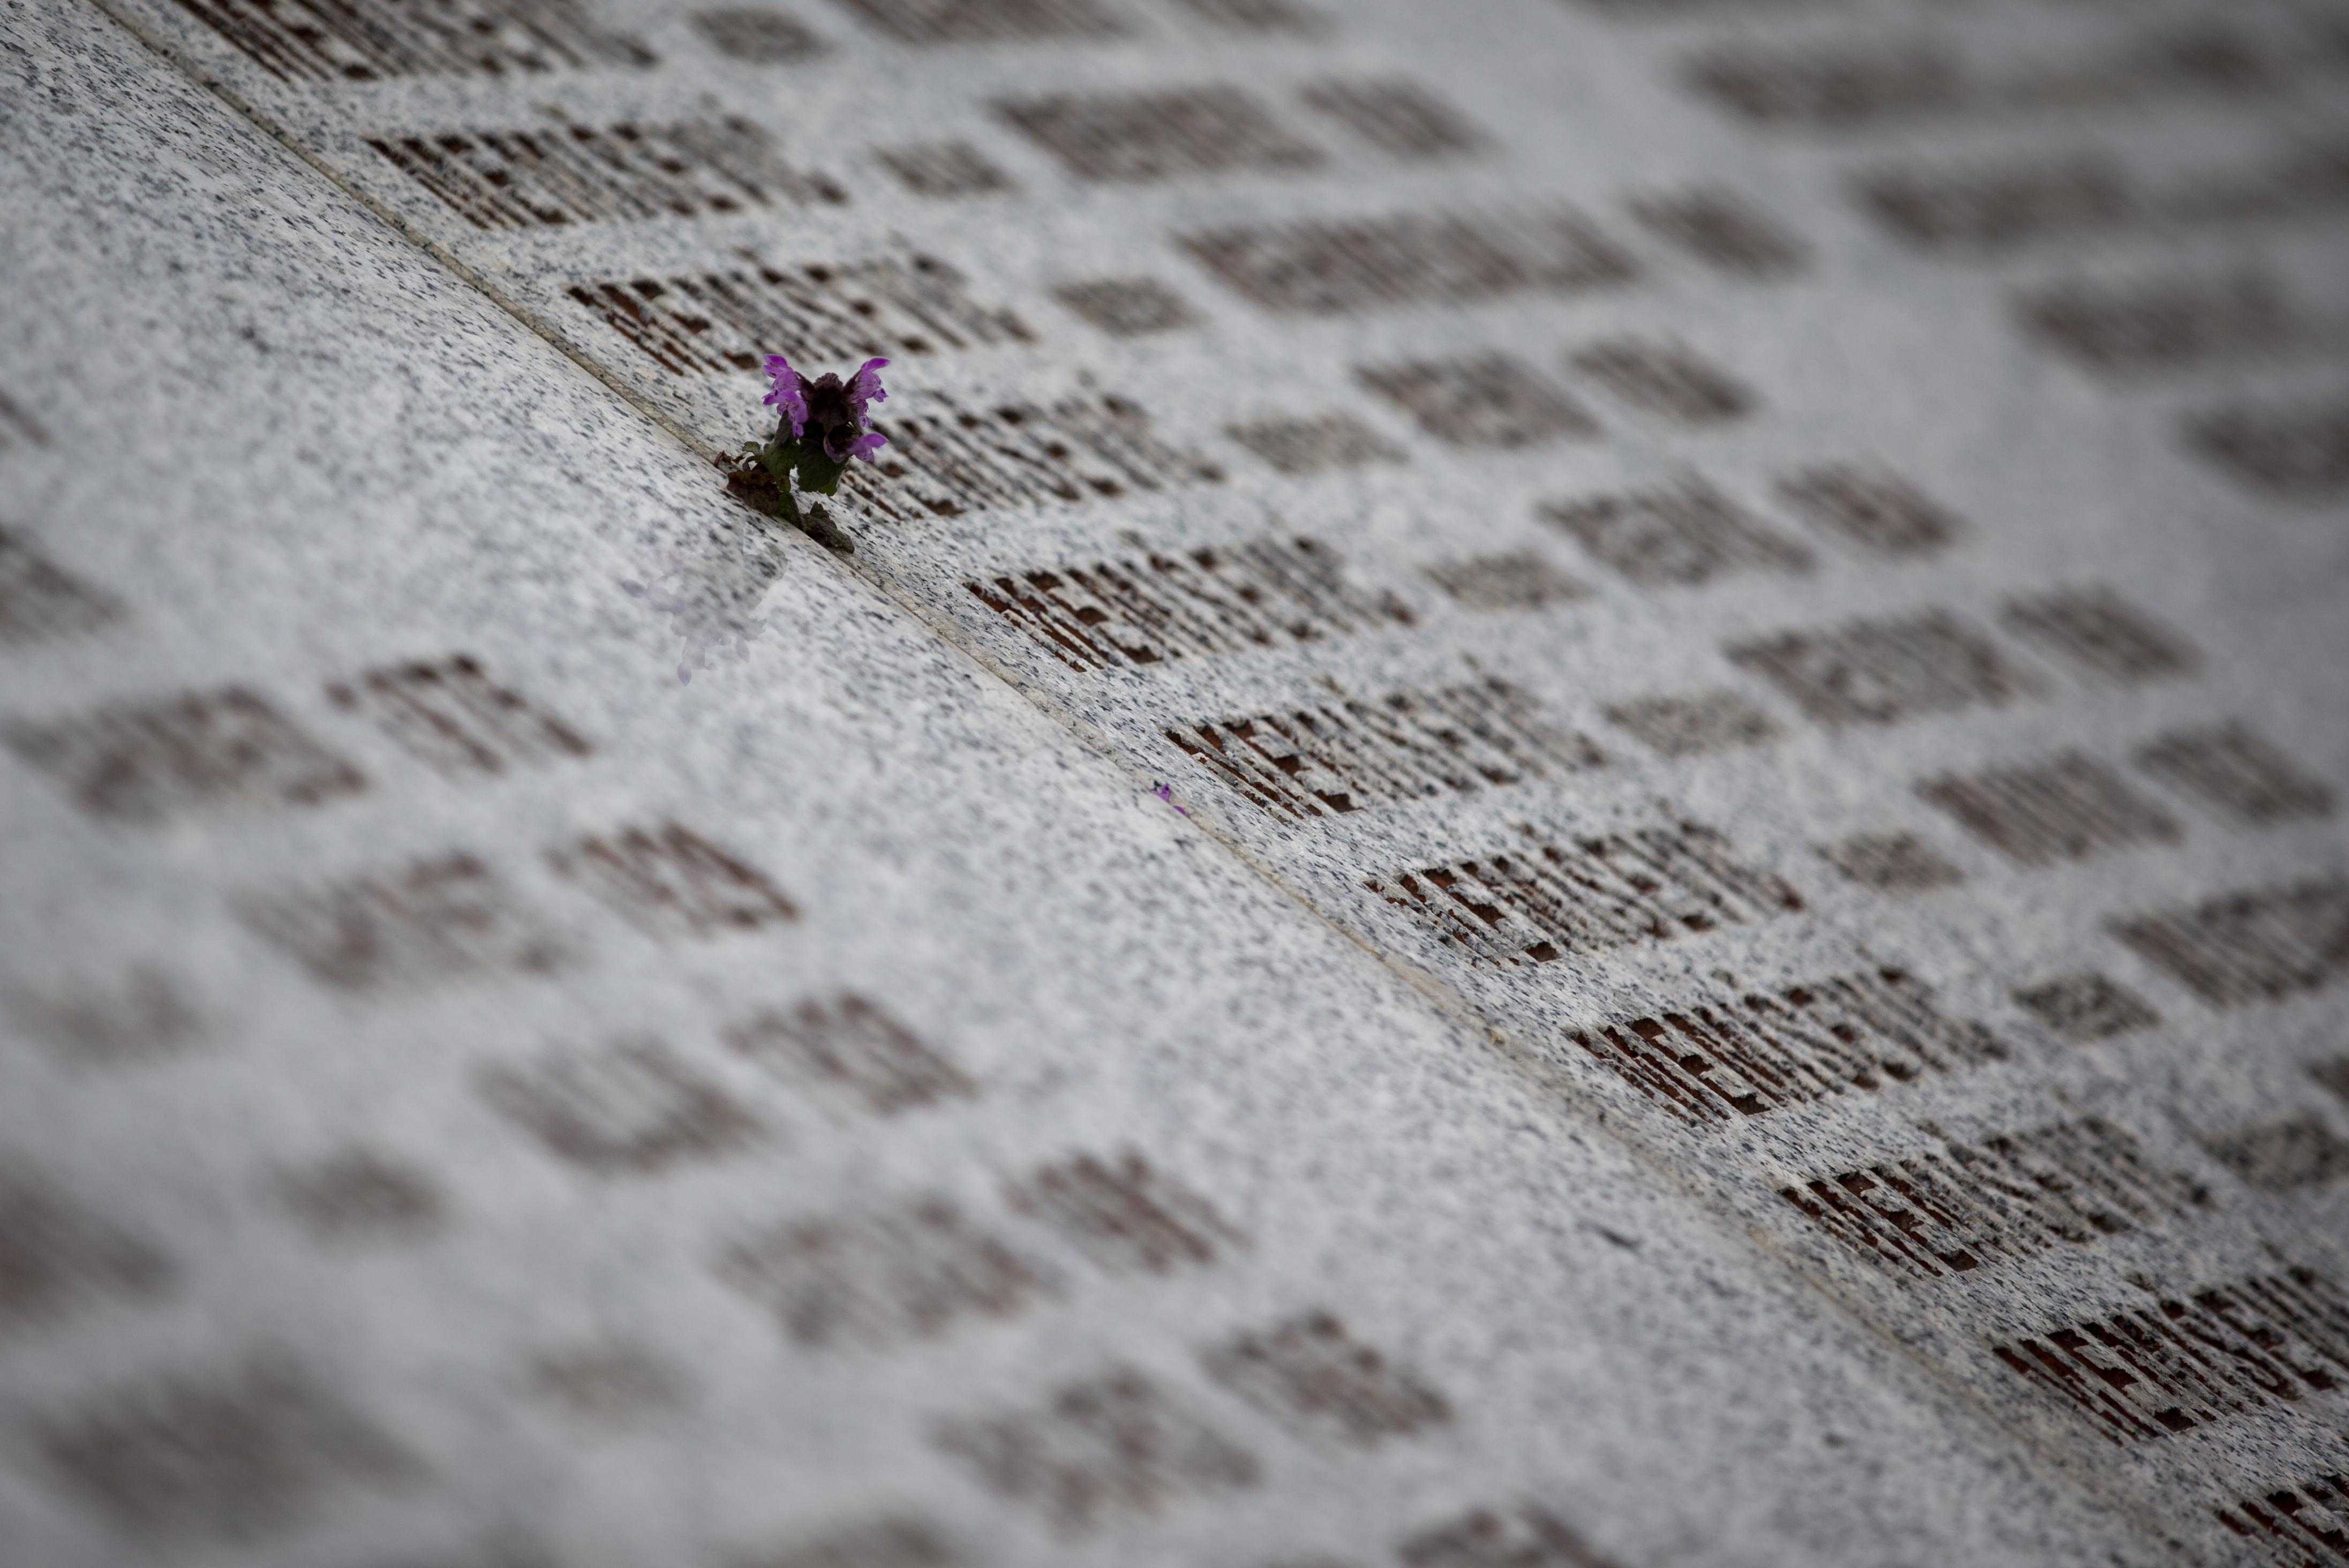 (AP Photo/Darko Bandic)